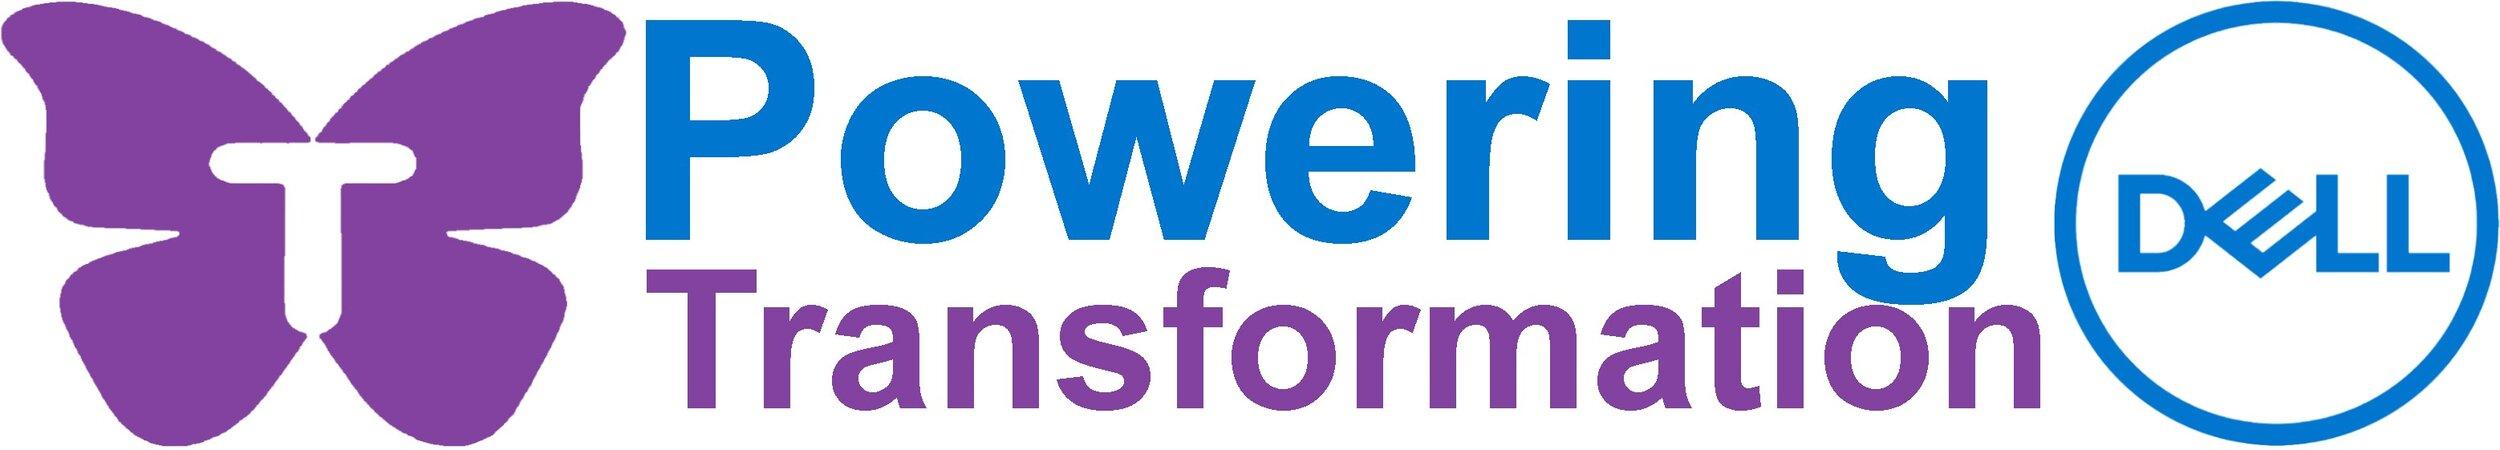 Powering Transformation logo 1.jpg